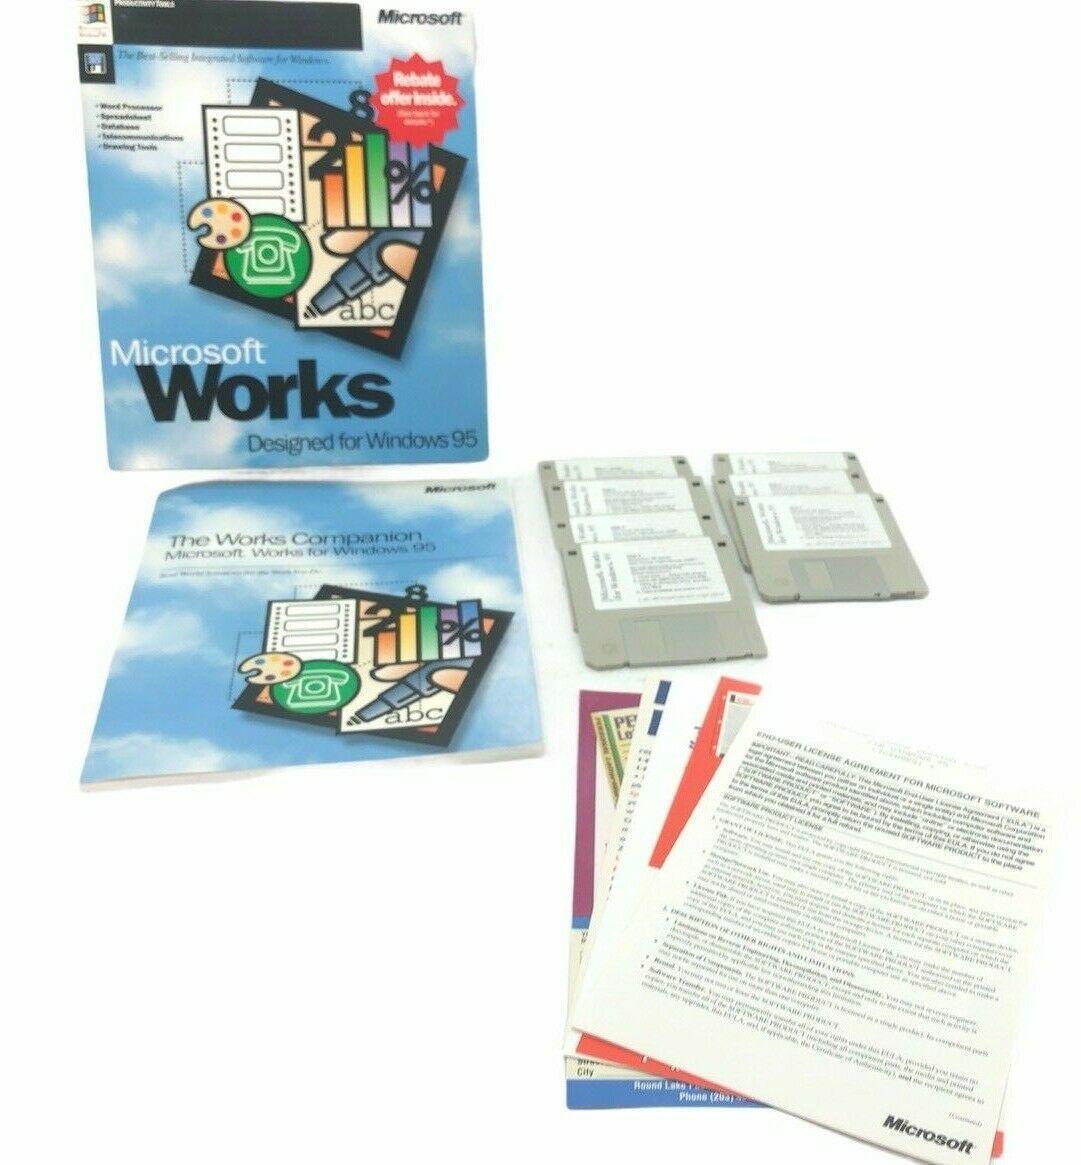 Microsoft Works 4.0 for Windows 95 Vintage Big Box PC Software Application 1-7 D - $51.19